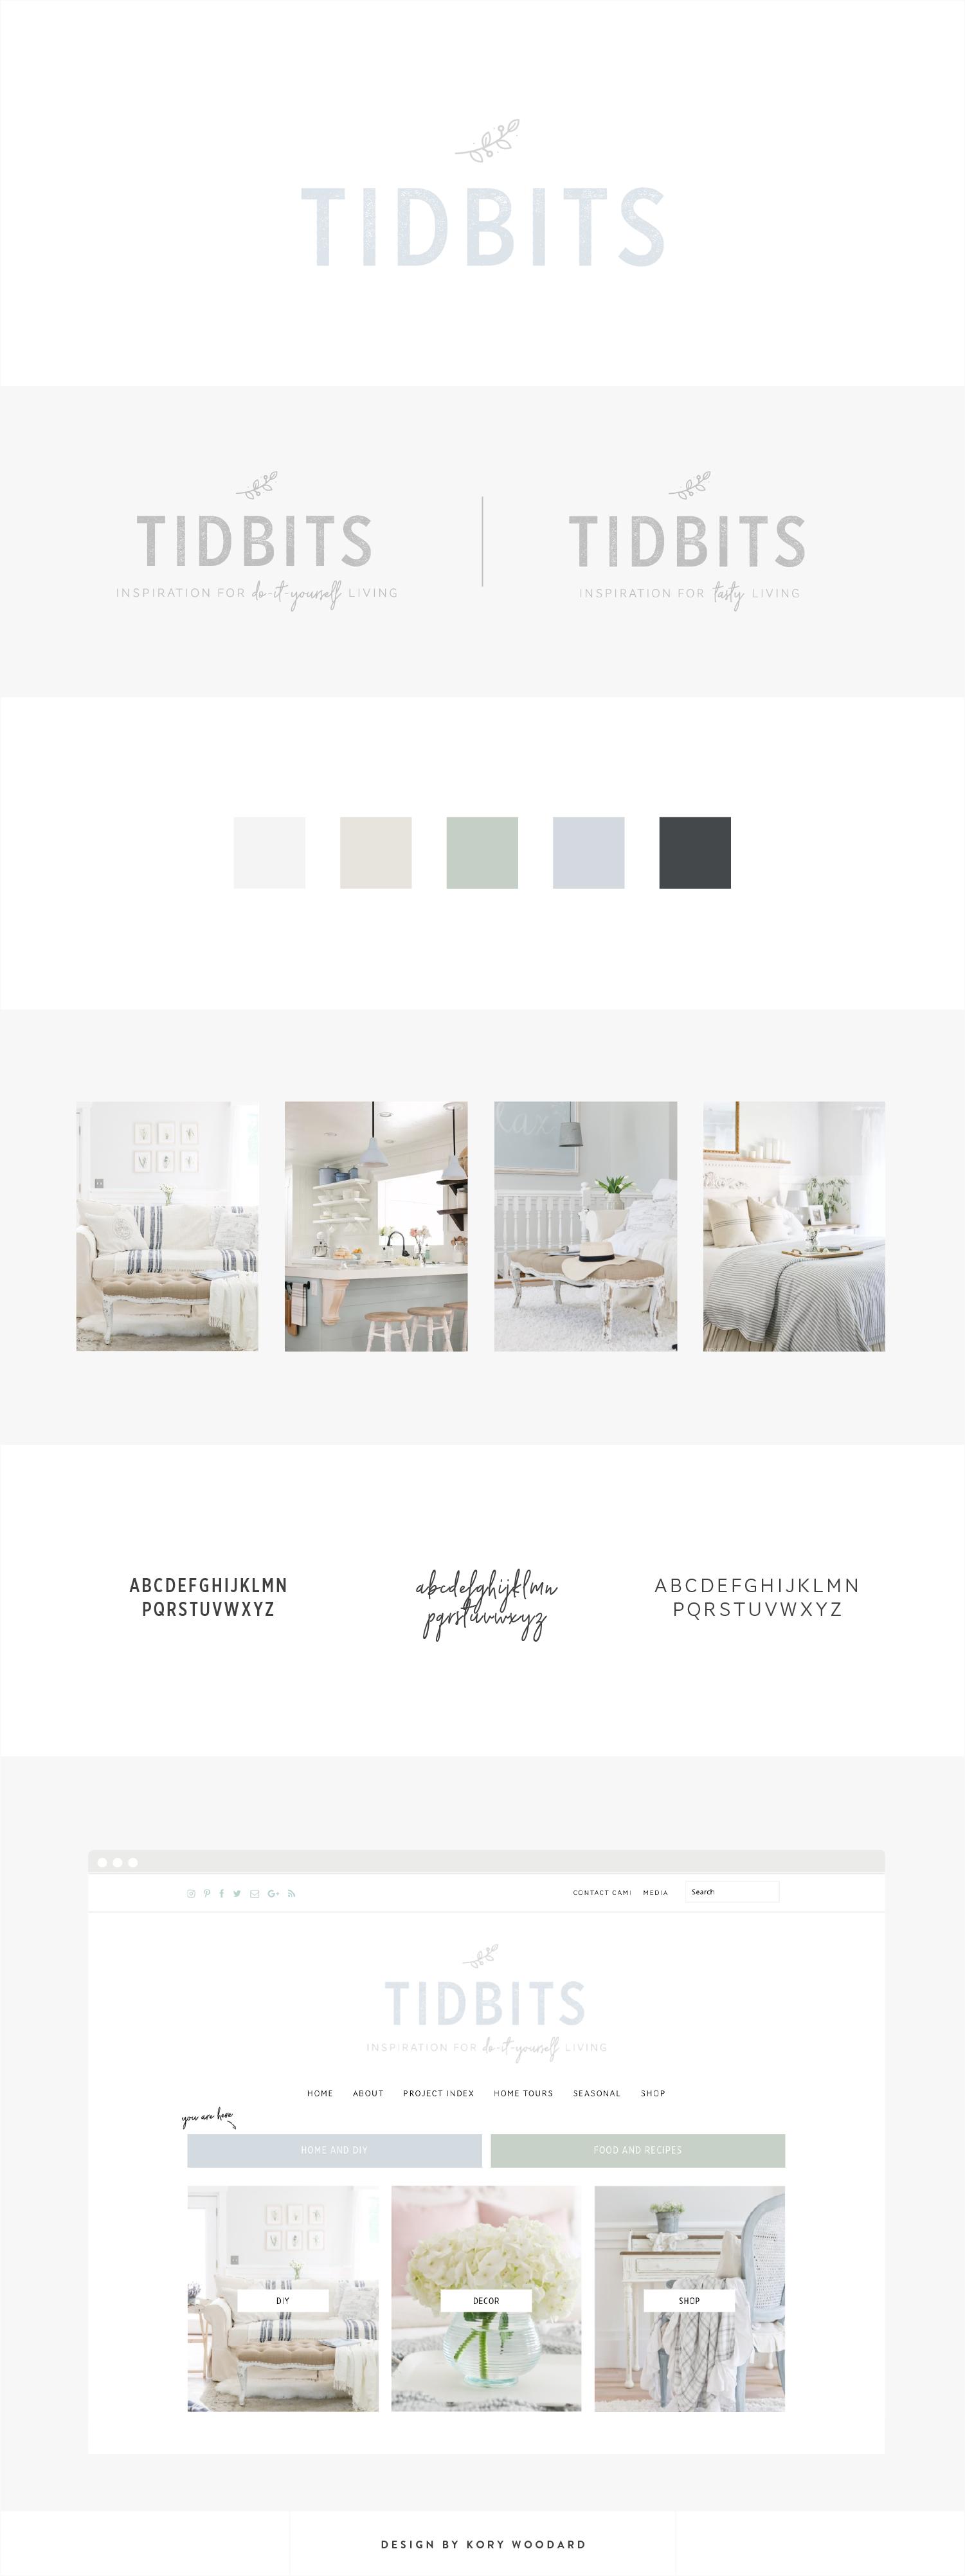 Tidbits | Branding + Blog Design by Kory Woodard